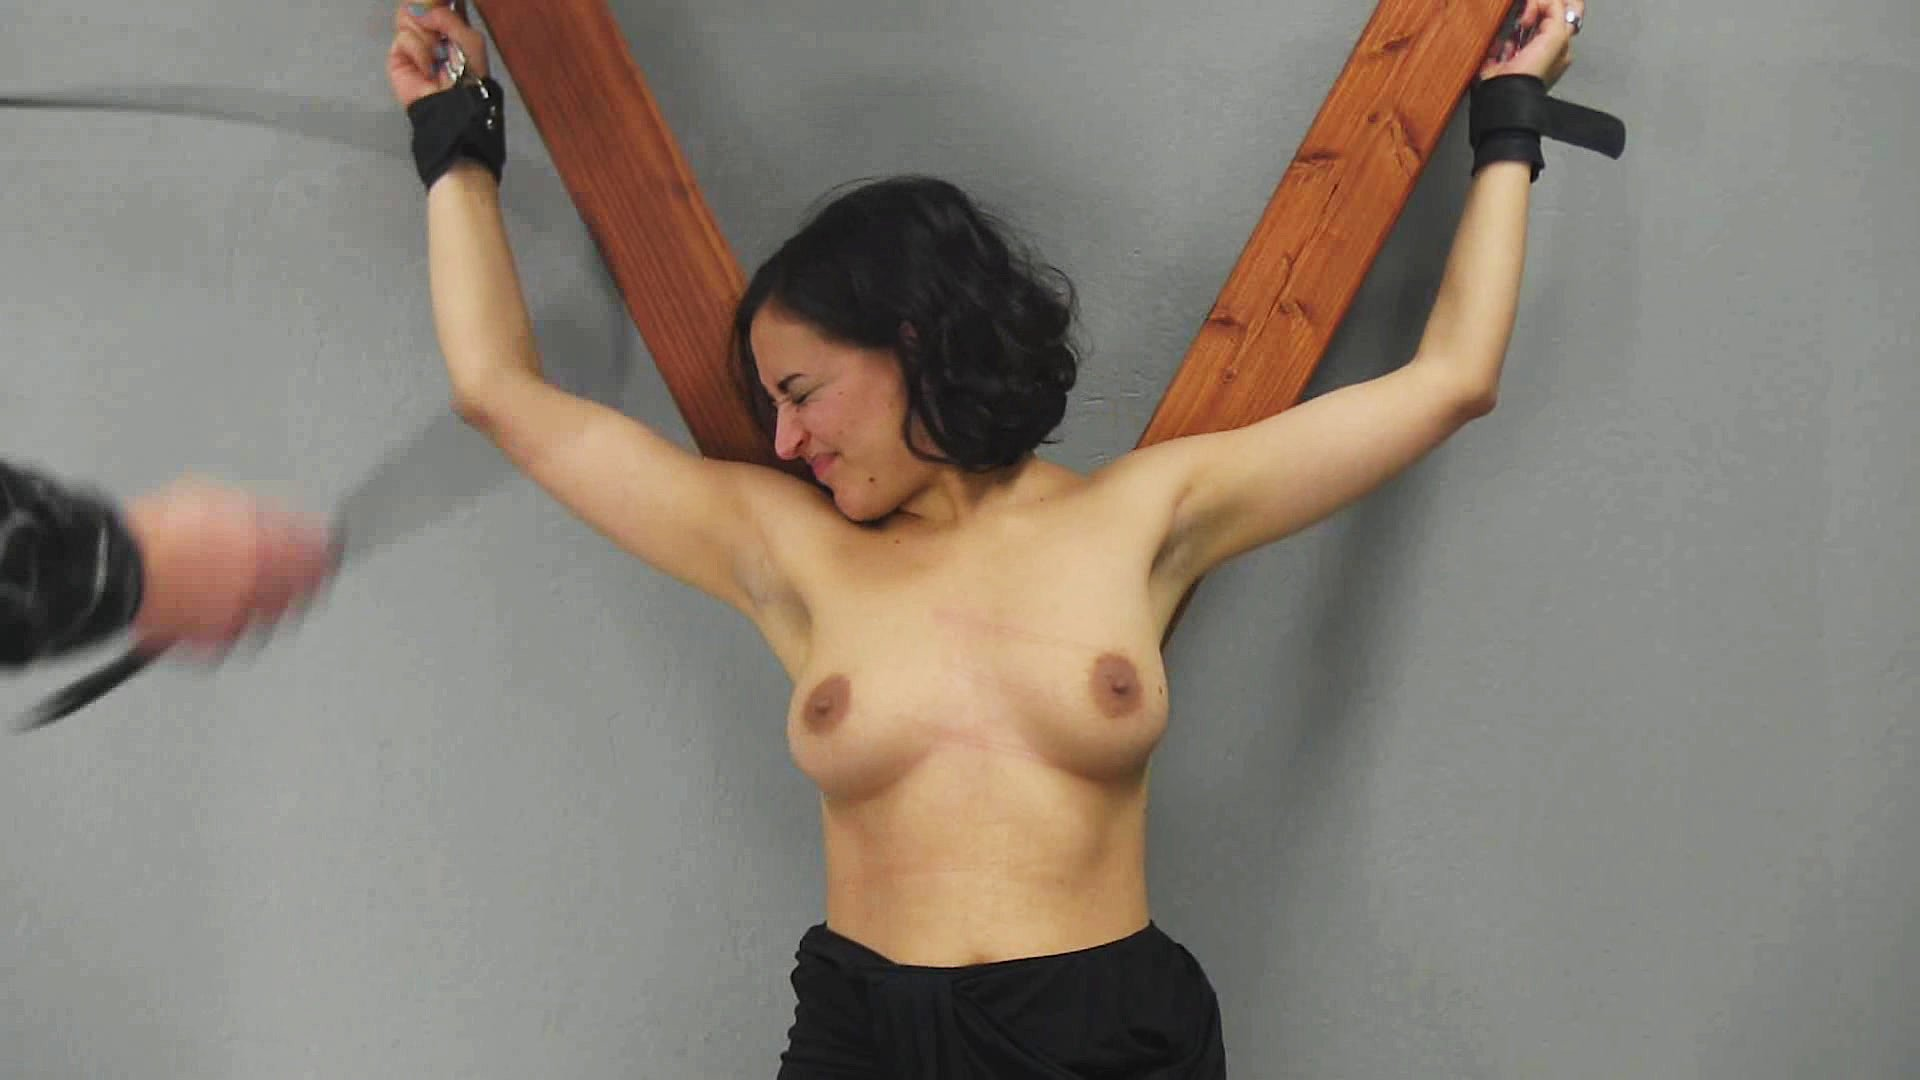 Bdsm breast floggings